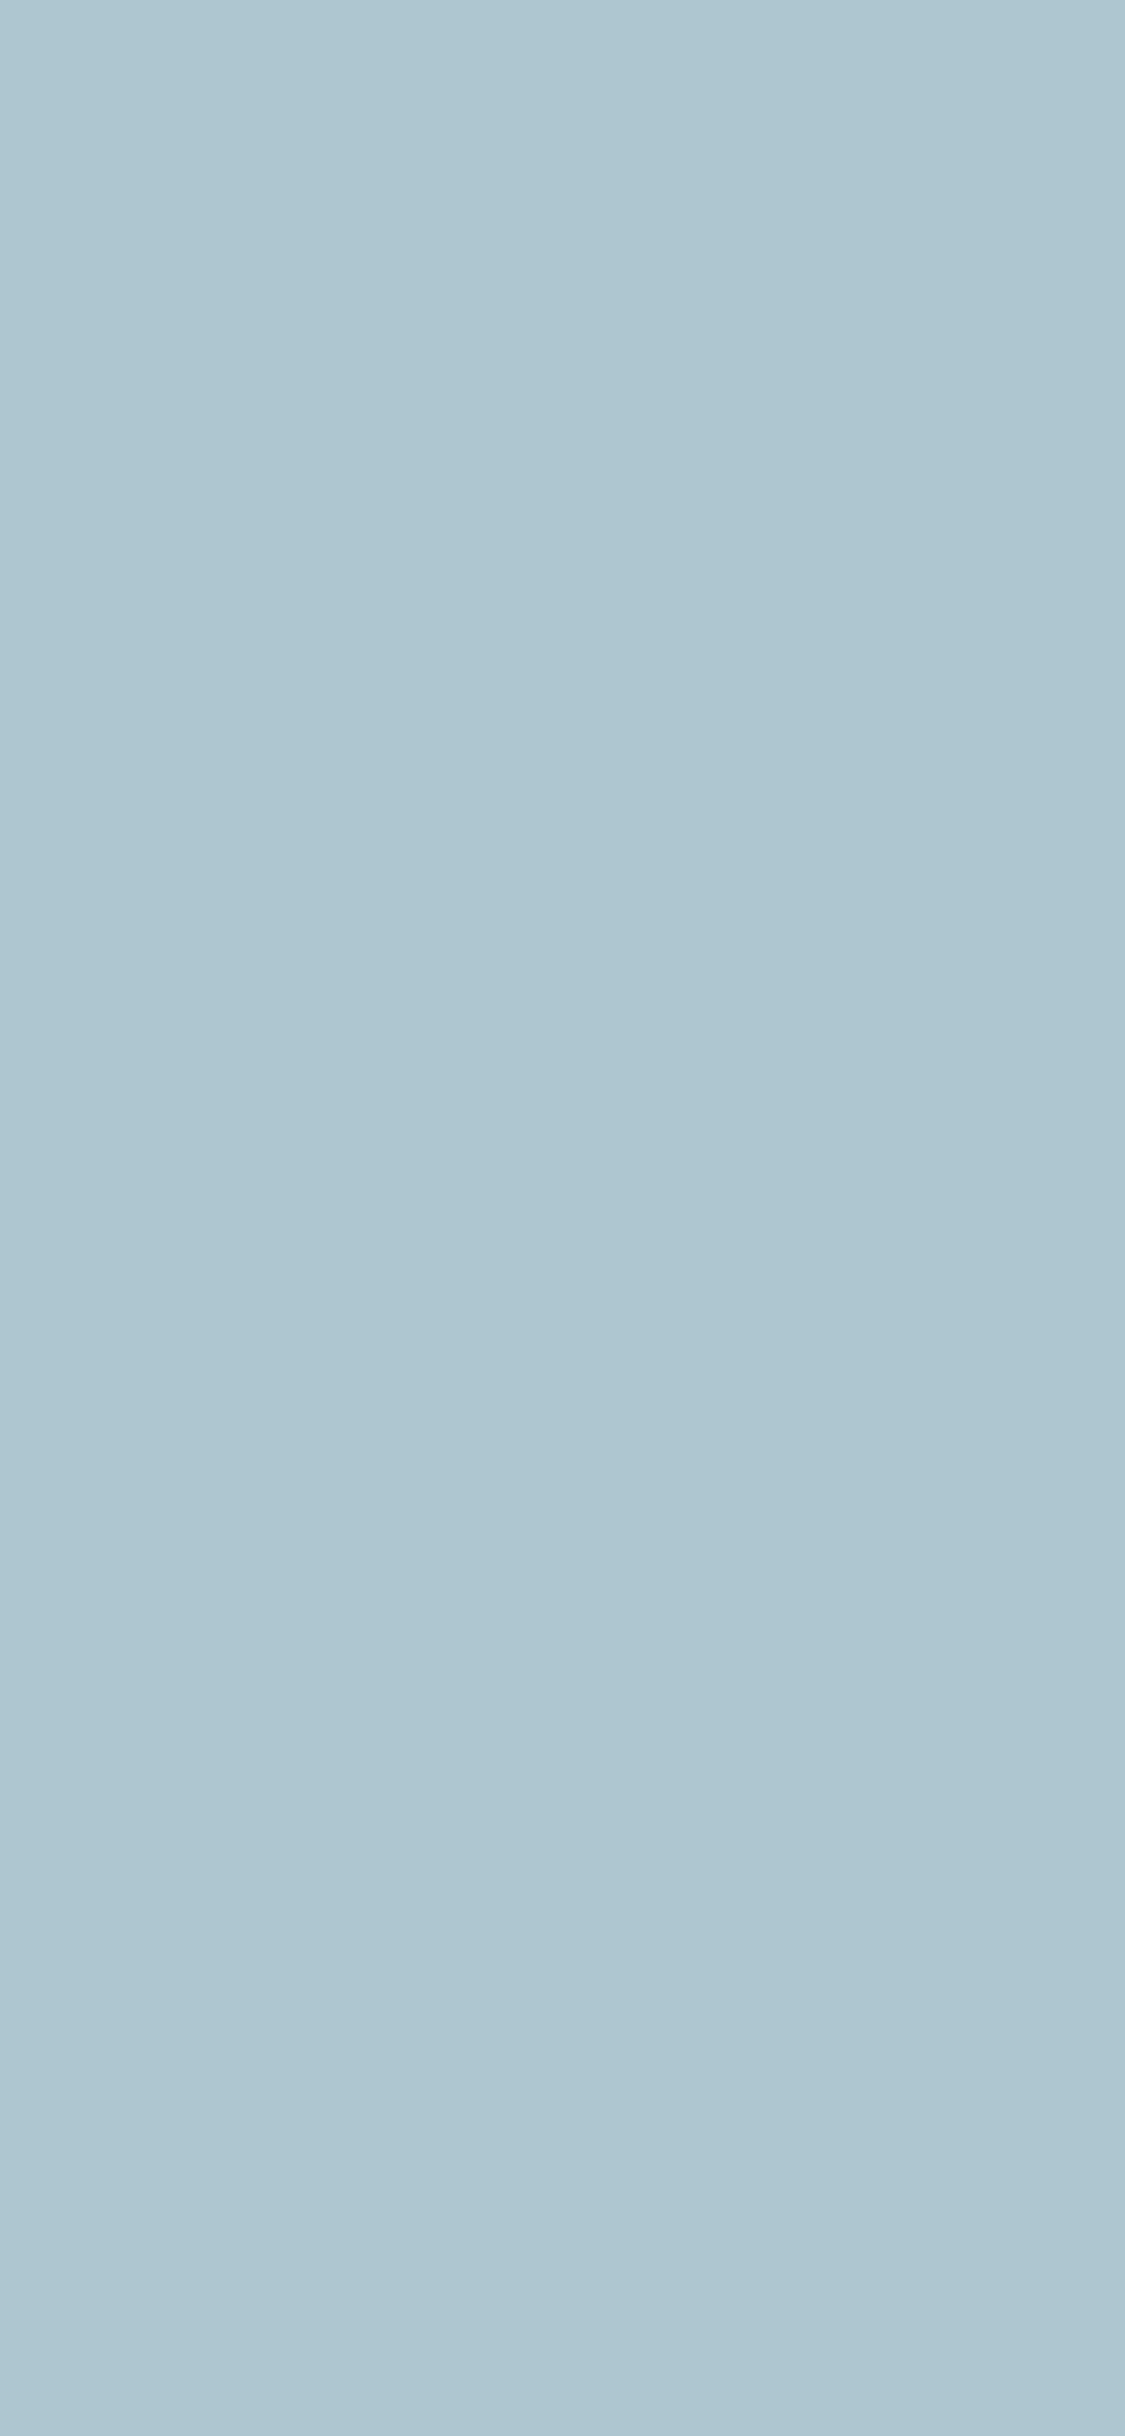 1125x2436 Pastel Blue Solid Color Background